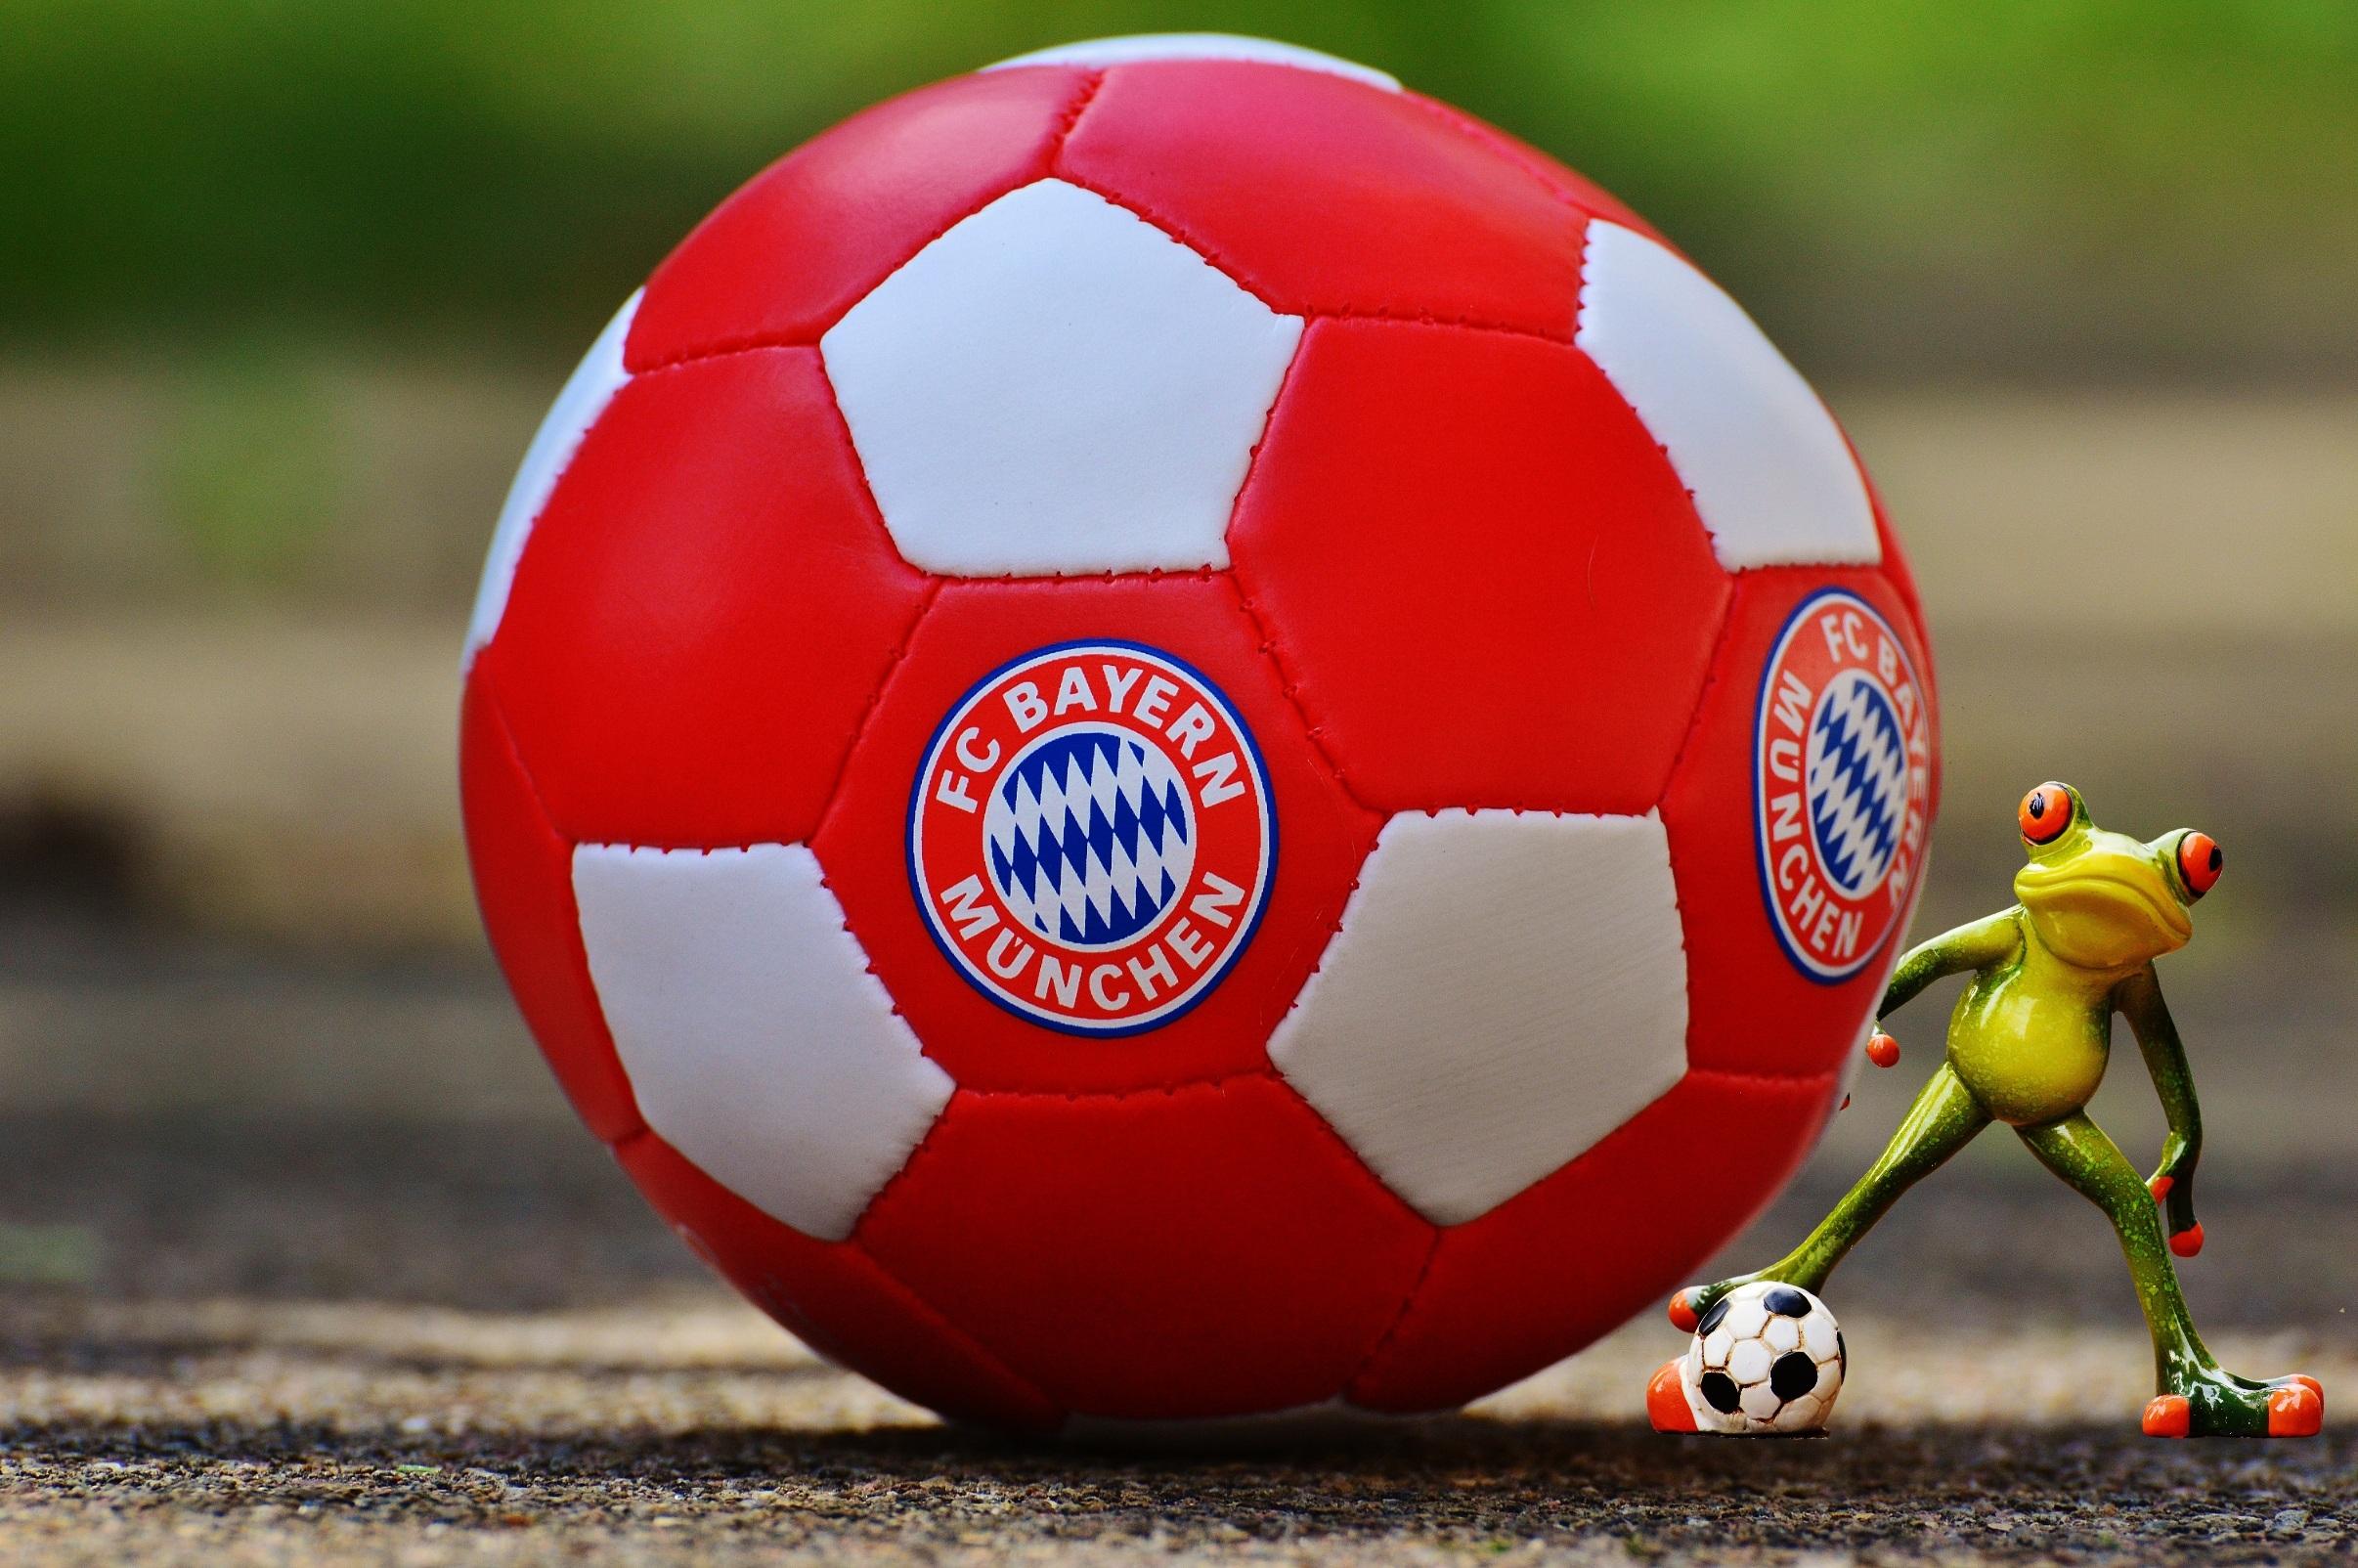 Gambar Merah Sepak Bola Katak Stadion Peralatan Olahraga Lucu Pemain Sepak Bola Arena Allianz Klub Sepak Bola Bavaria Munich Bayern Munich 2412x1604 806029 Galeri Foto Pxhere